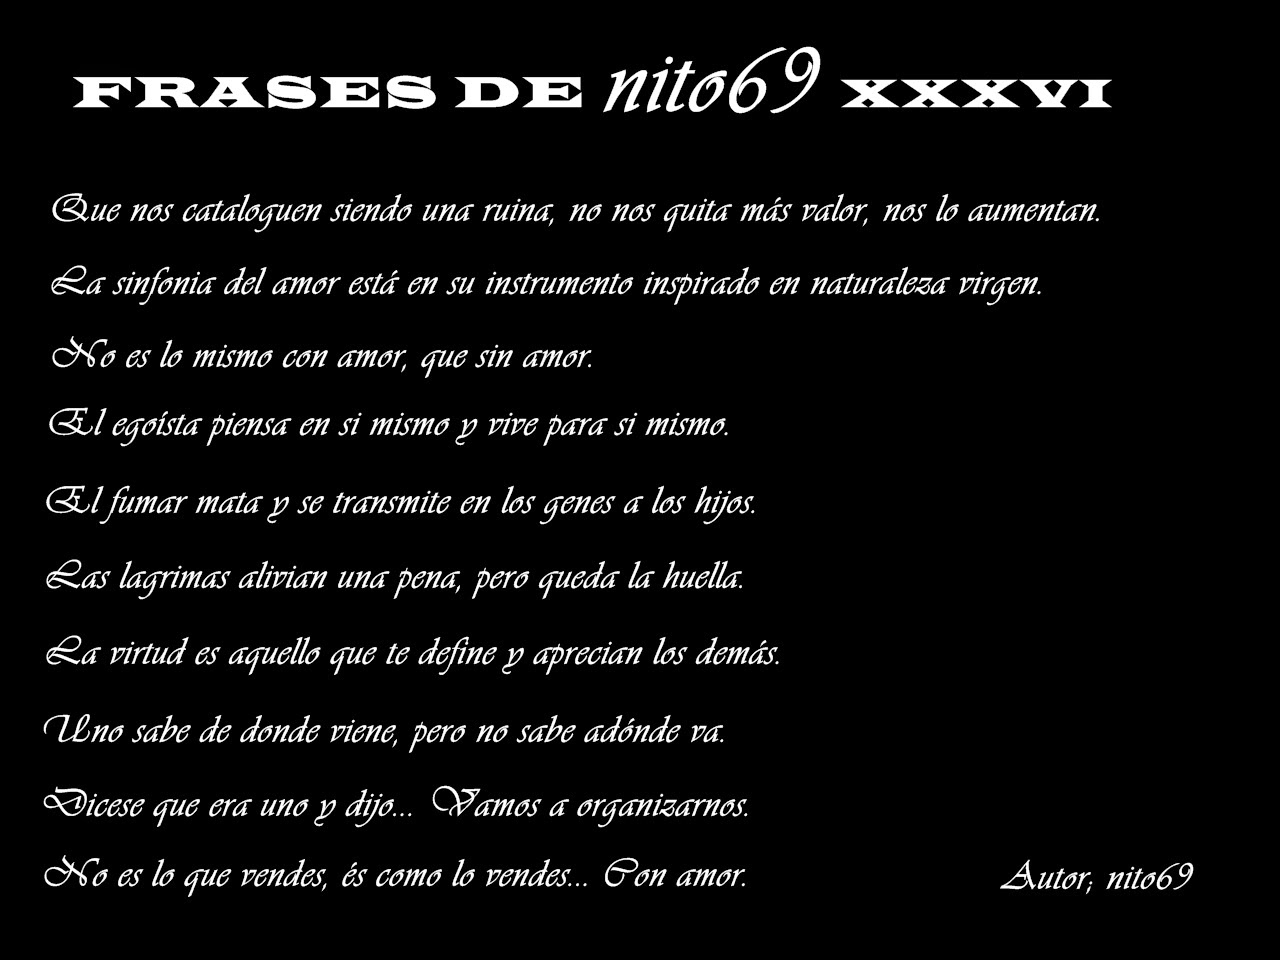 FRASES DE nito69 XXXVI